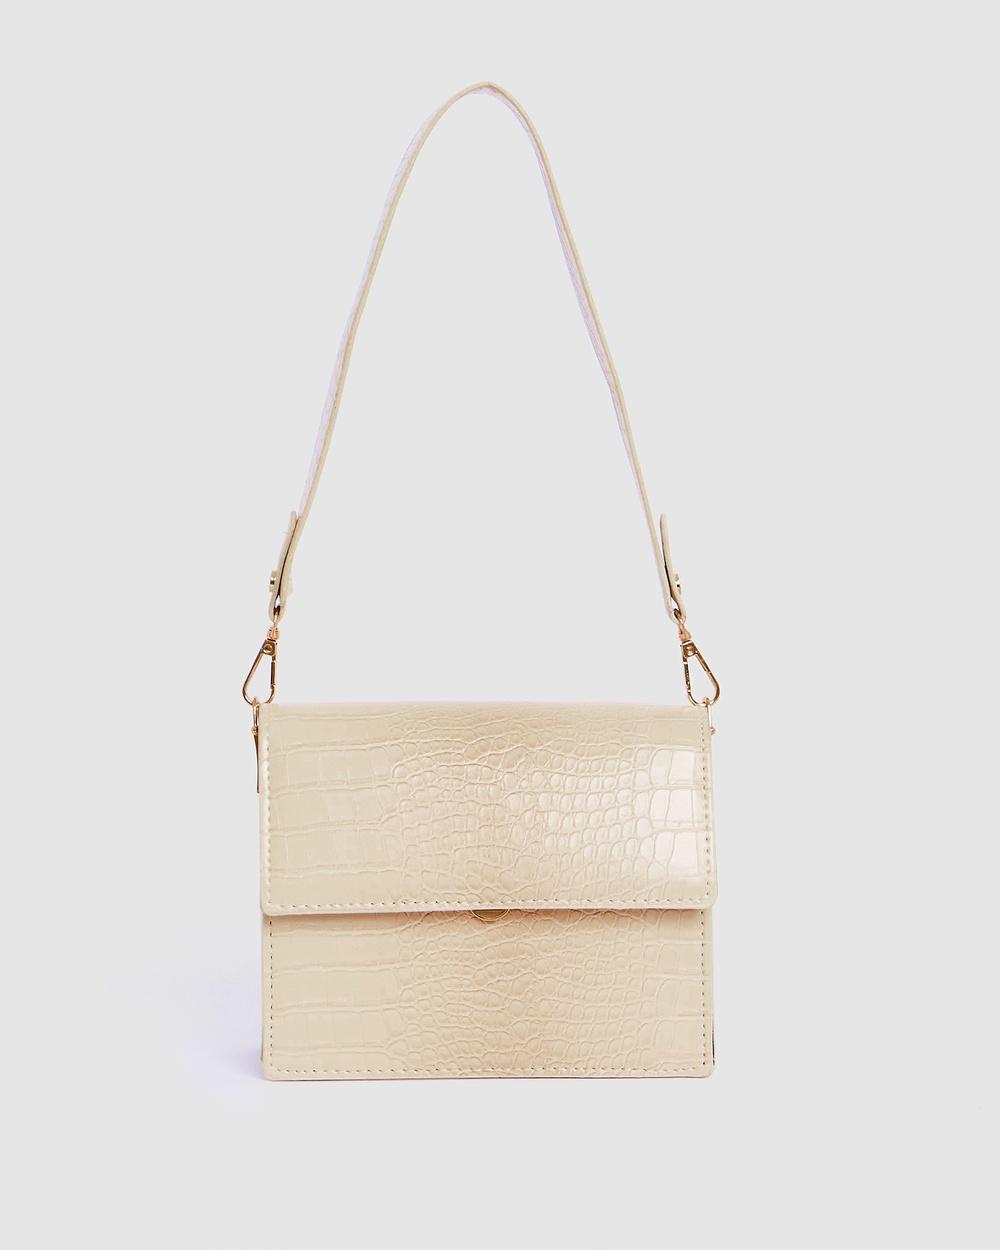 Calli Forrester Concertina Bag Handbags Beige Handbags Australia